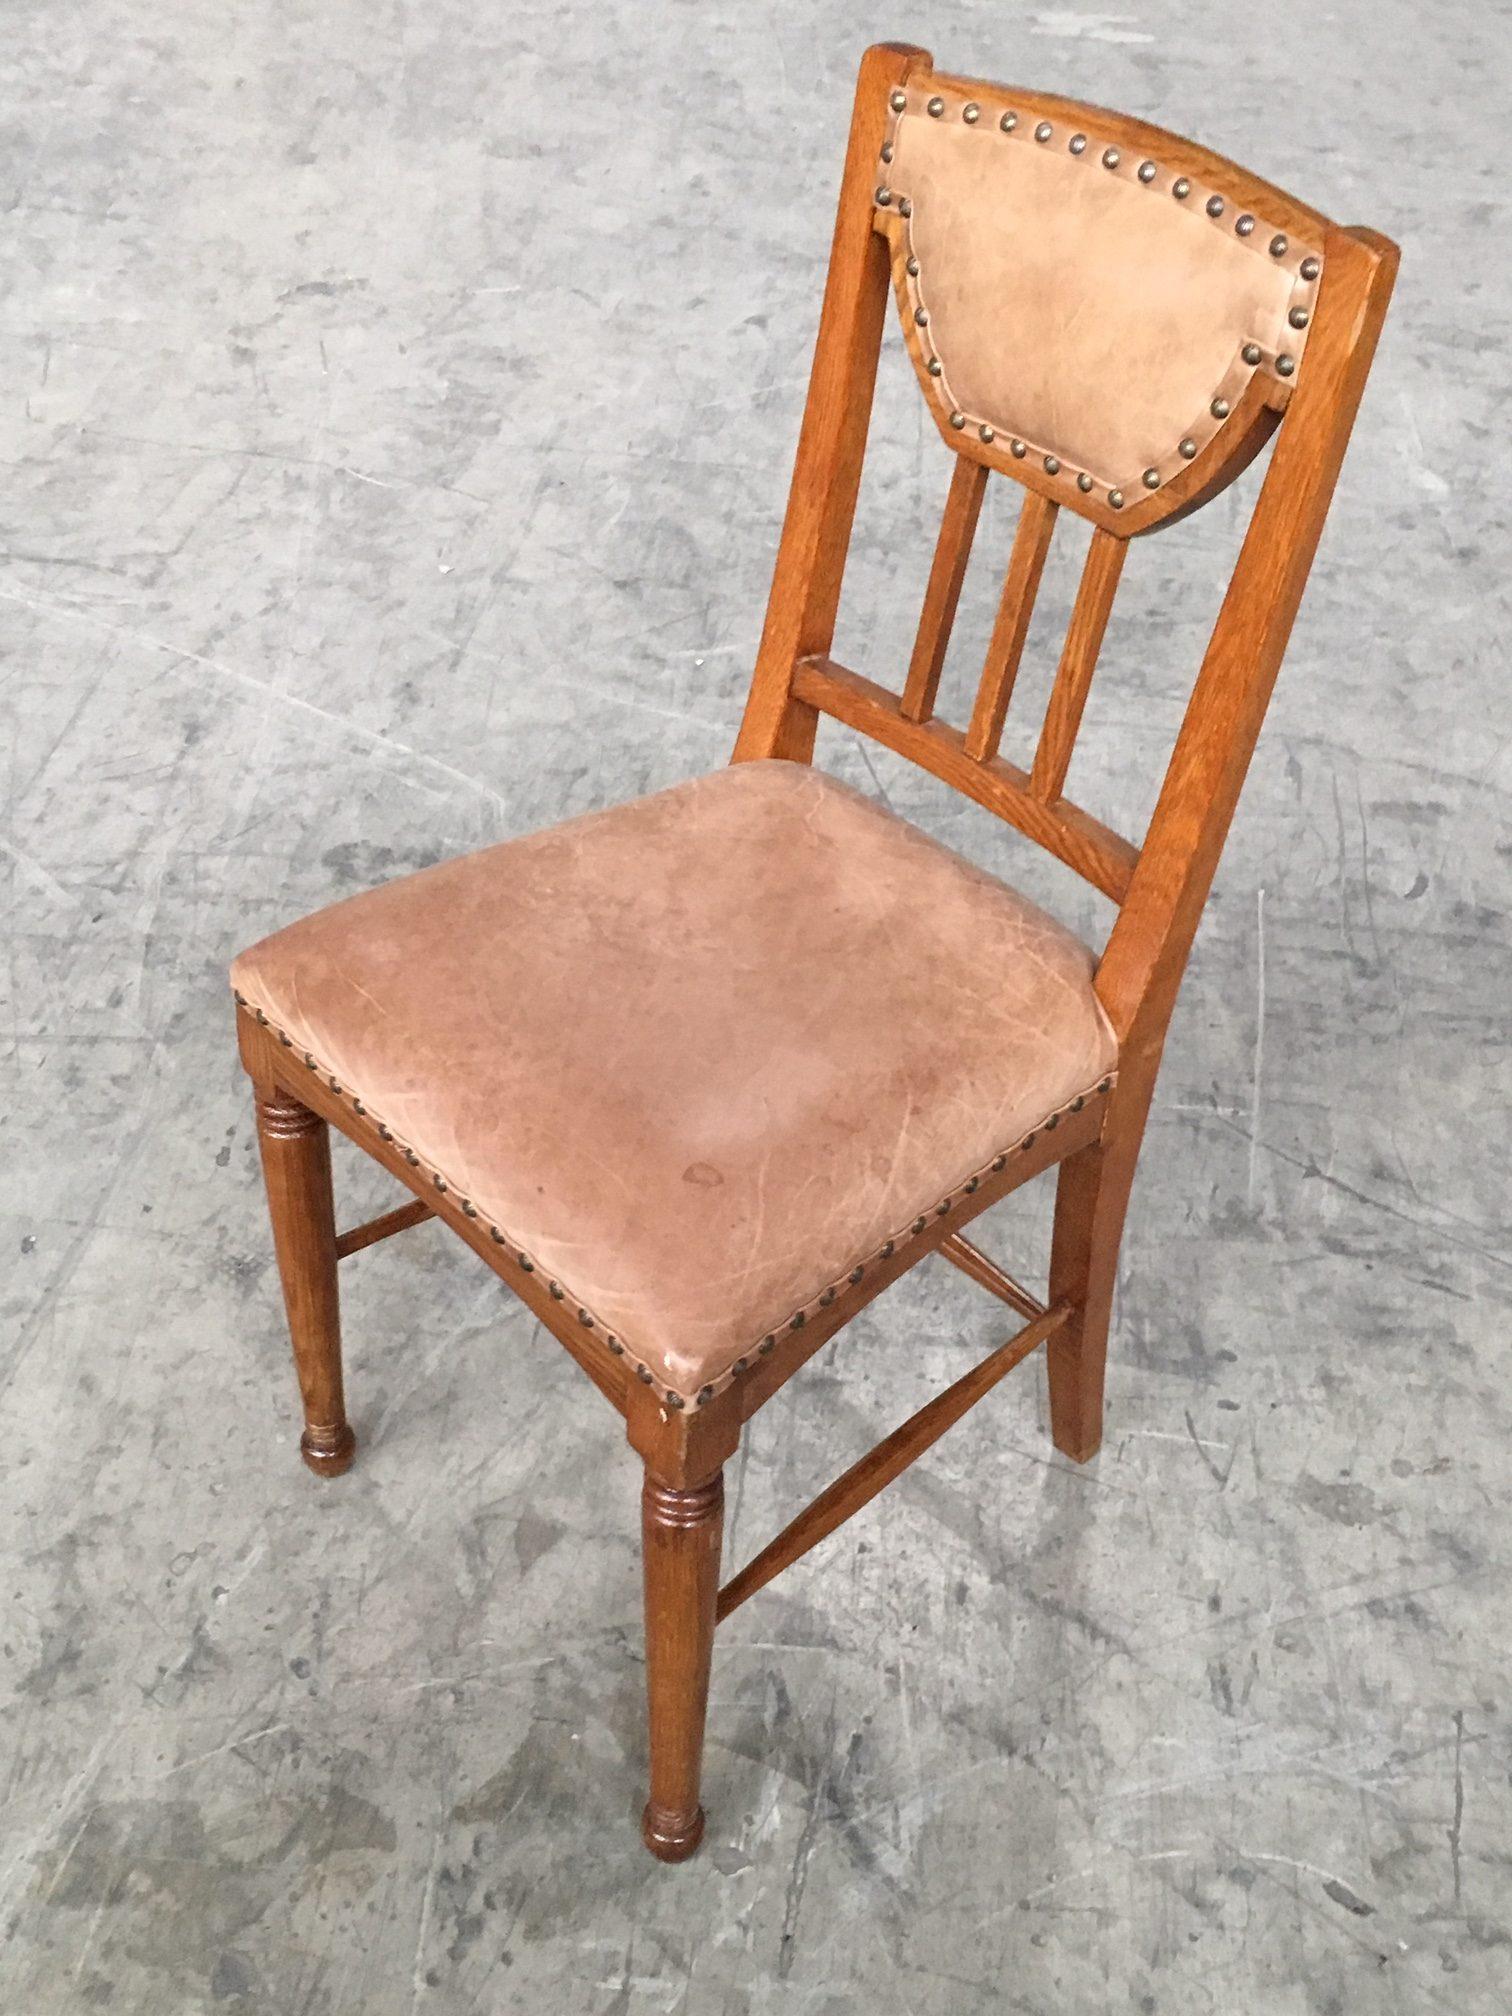 5 Stühle aus Holz - Dudlerei